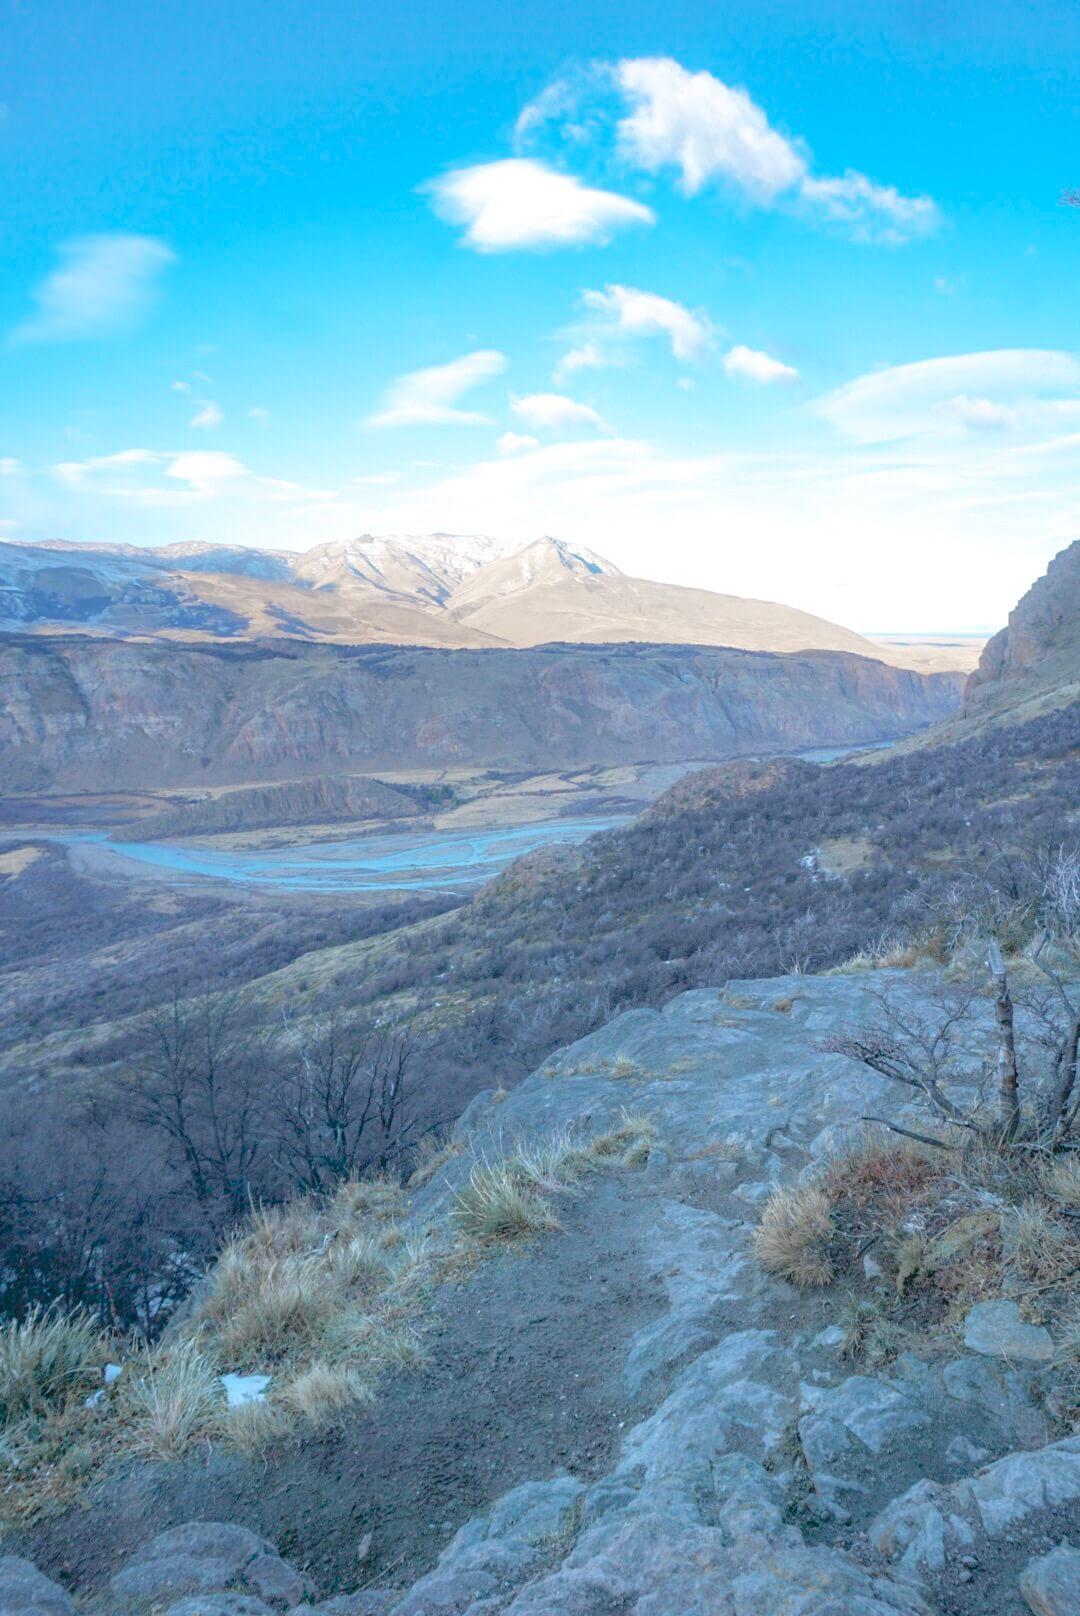 Fitz roy randonnée patagonie